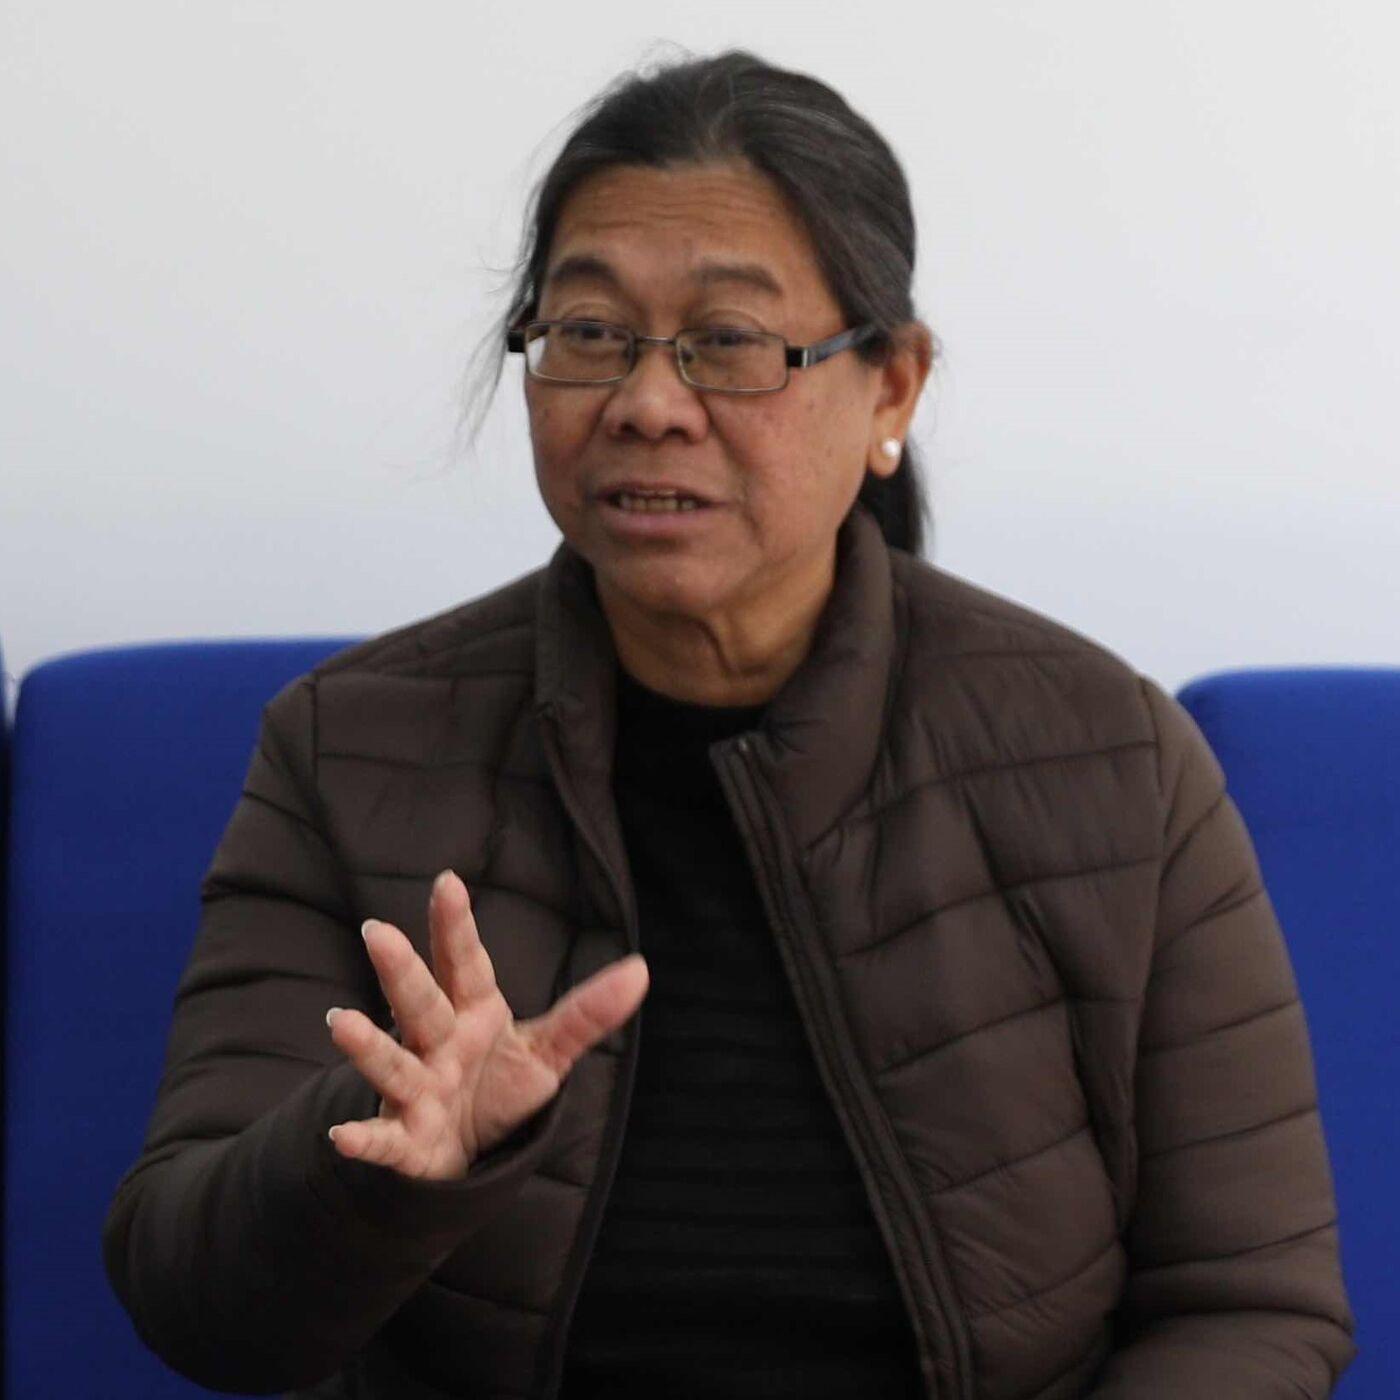 21: Seeking Safety: Internal Displacement in Libya with Cecilia Jimenez-Damary